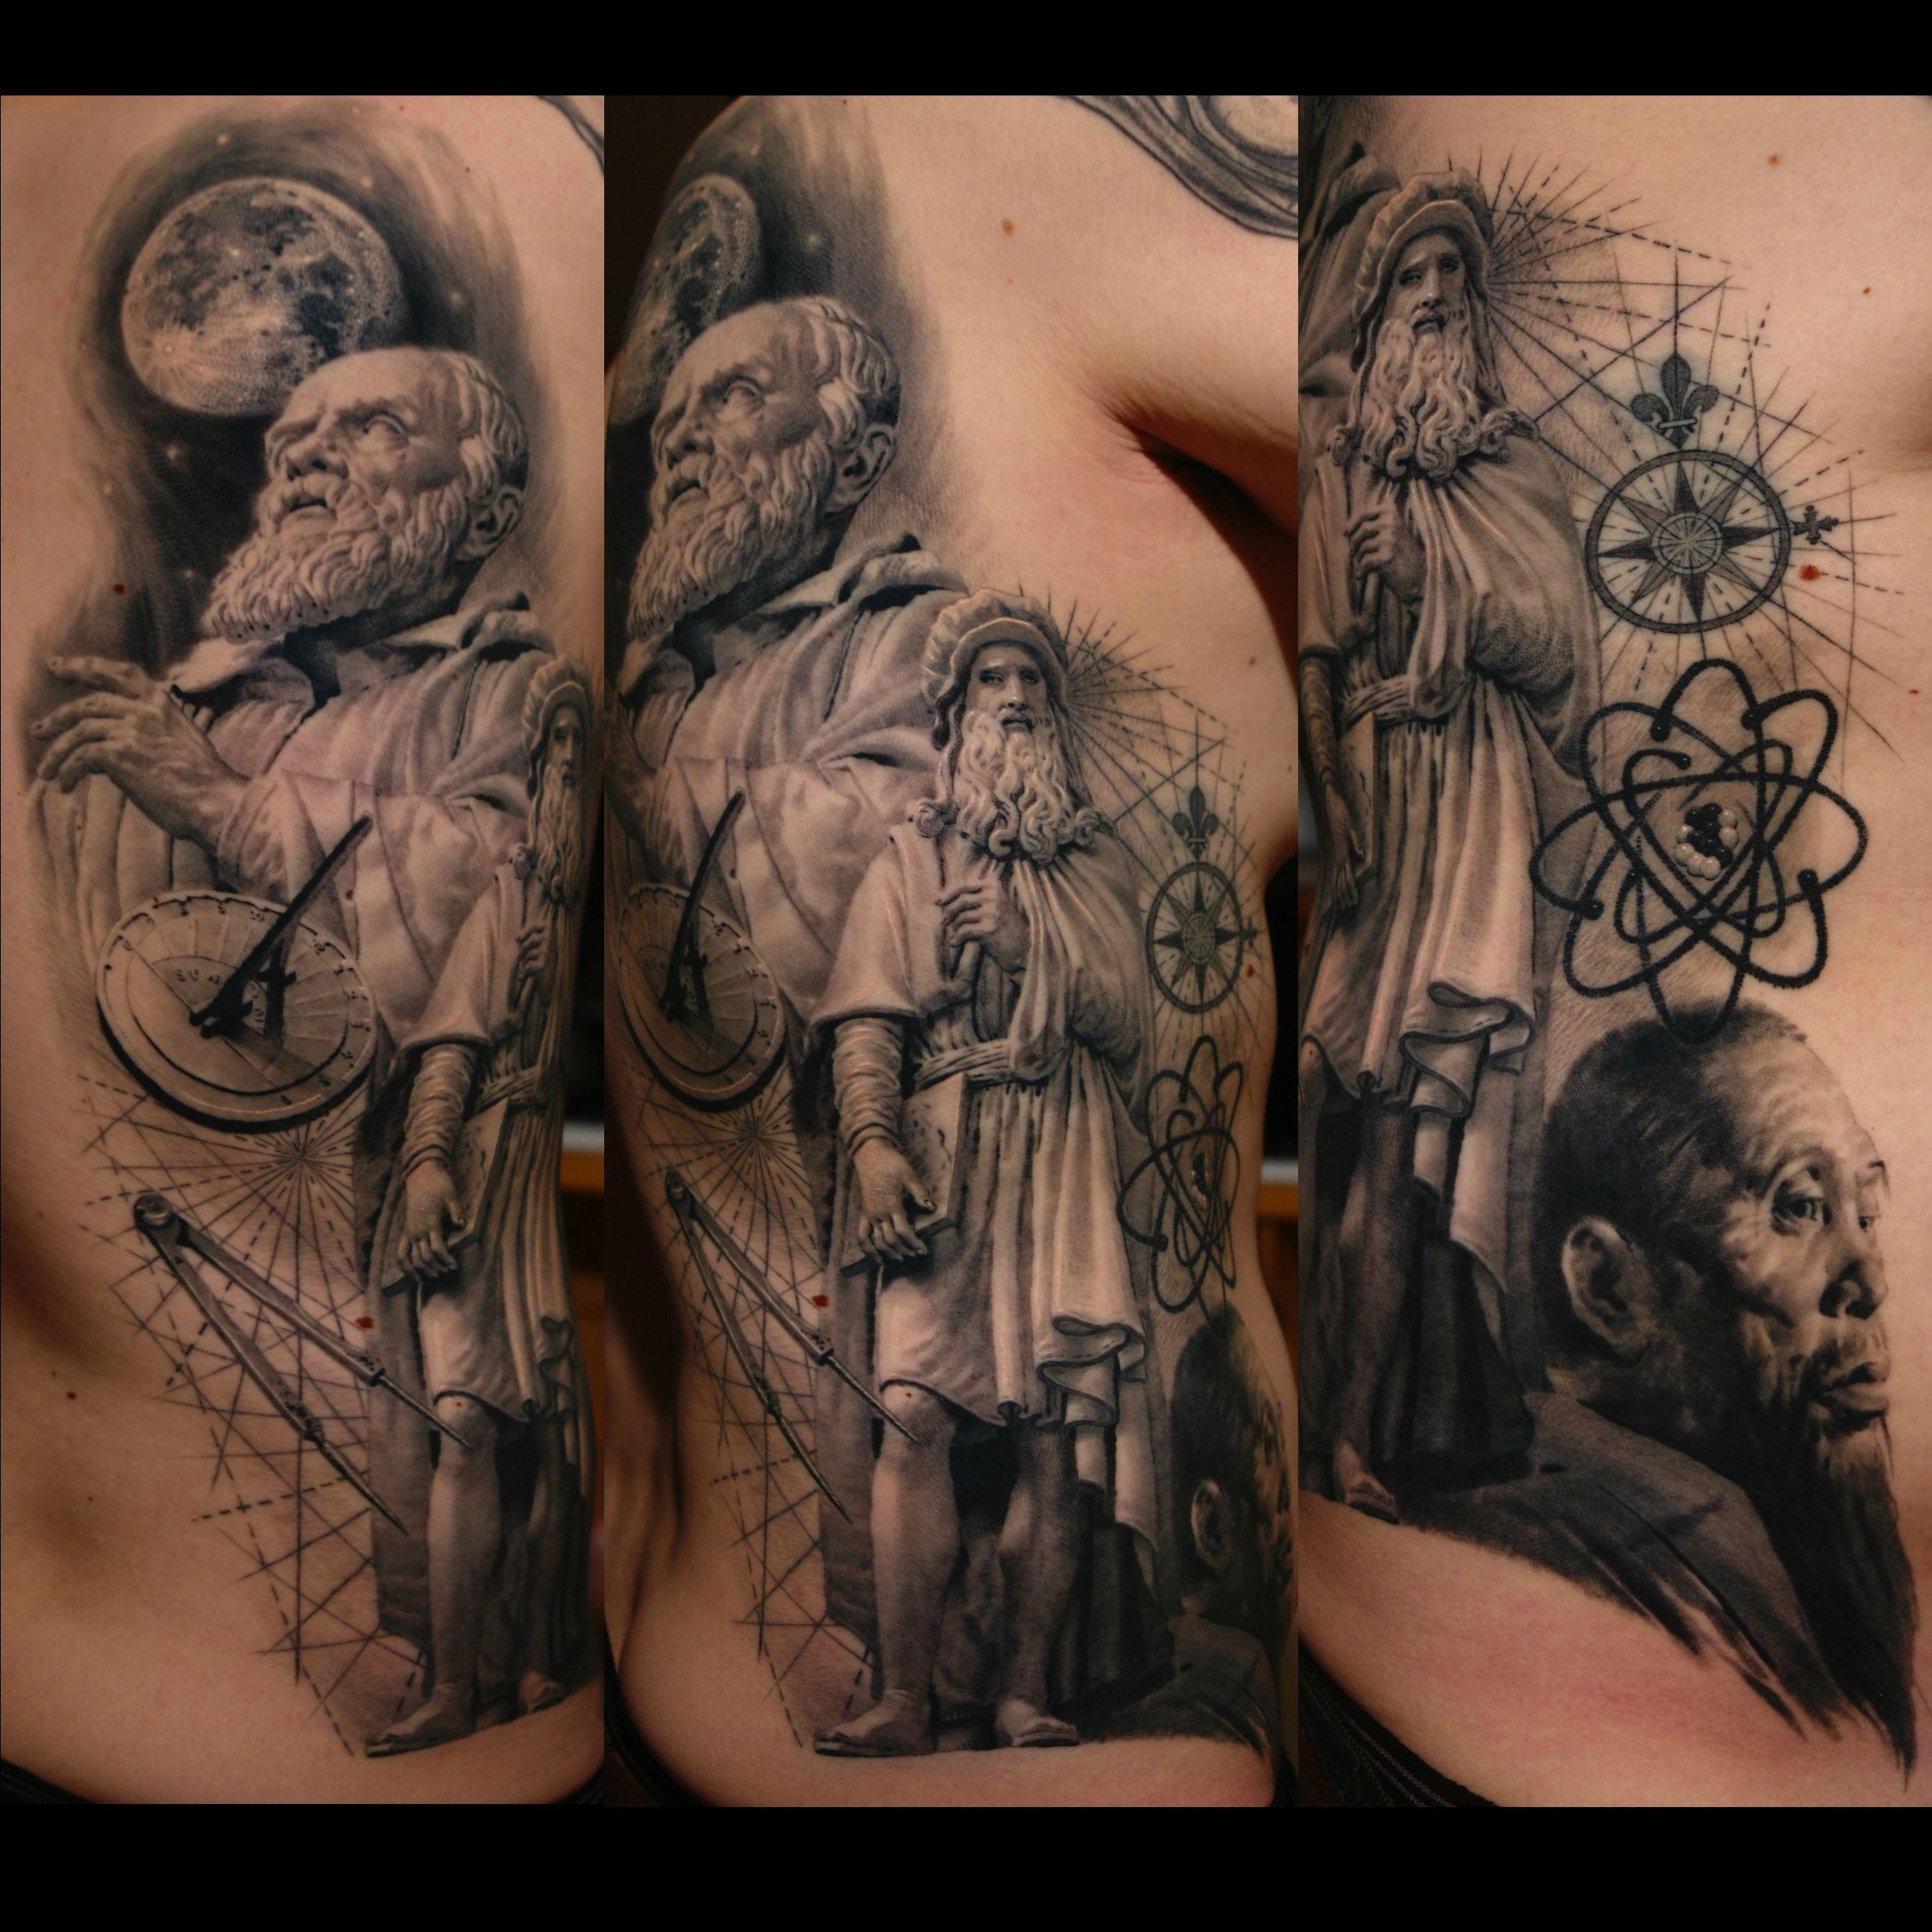 Sergio Sanchez Timeline Gallery San Pedro Ca Science Art Philosophy Imgur Tattoo Designs Men Body Art Tattoos Tattoo Designs